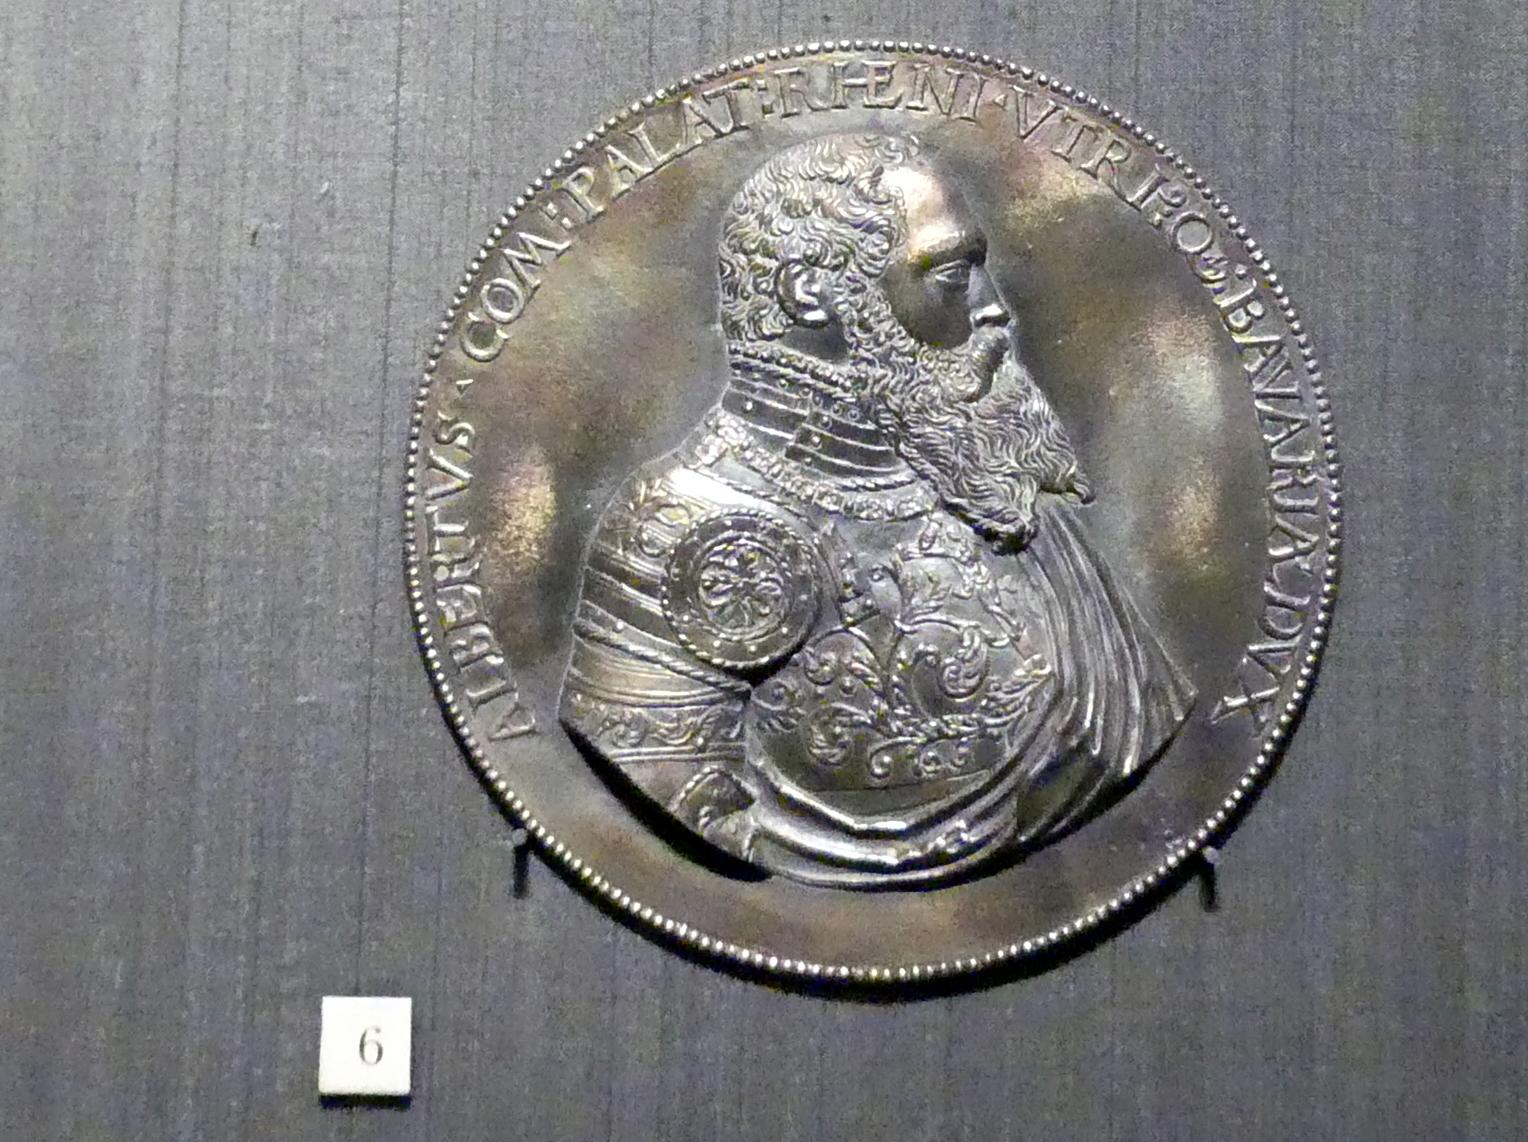 Hans Aesslinger: Albrecht V. von Bayern, 1558